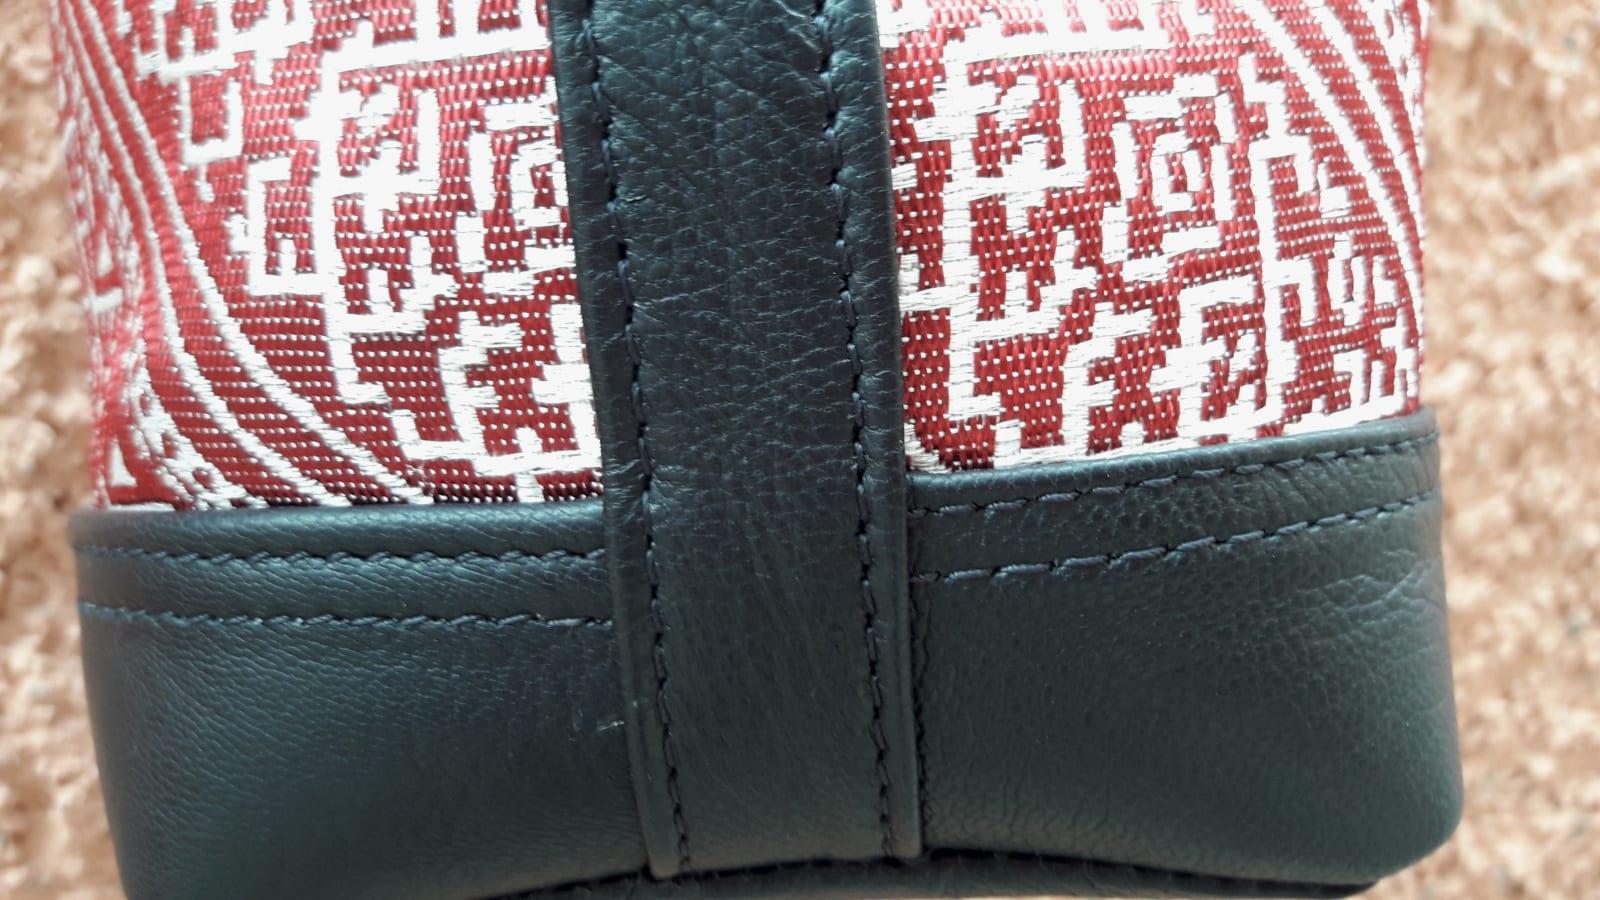 bag leather and Sabra silk Red, Black Morocco